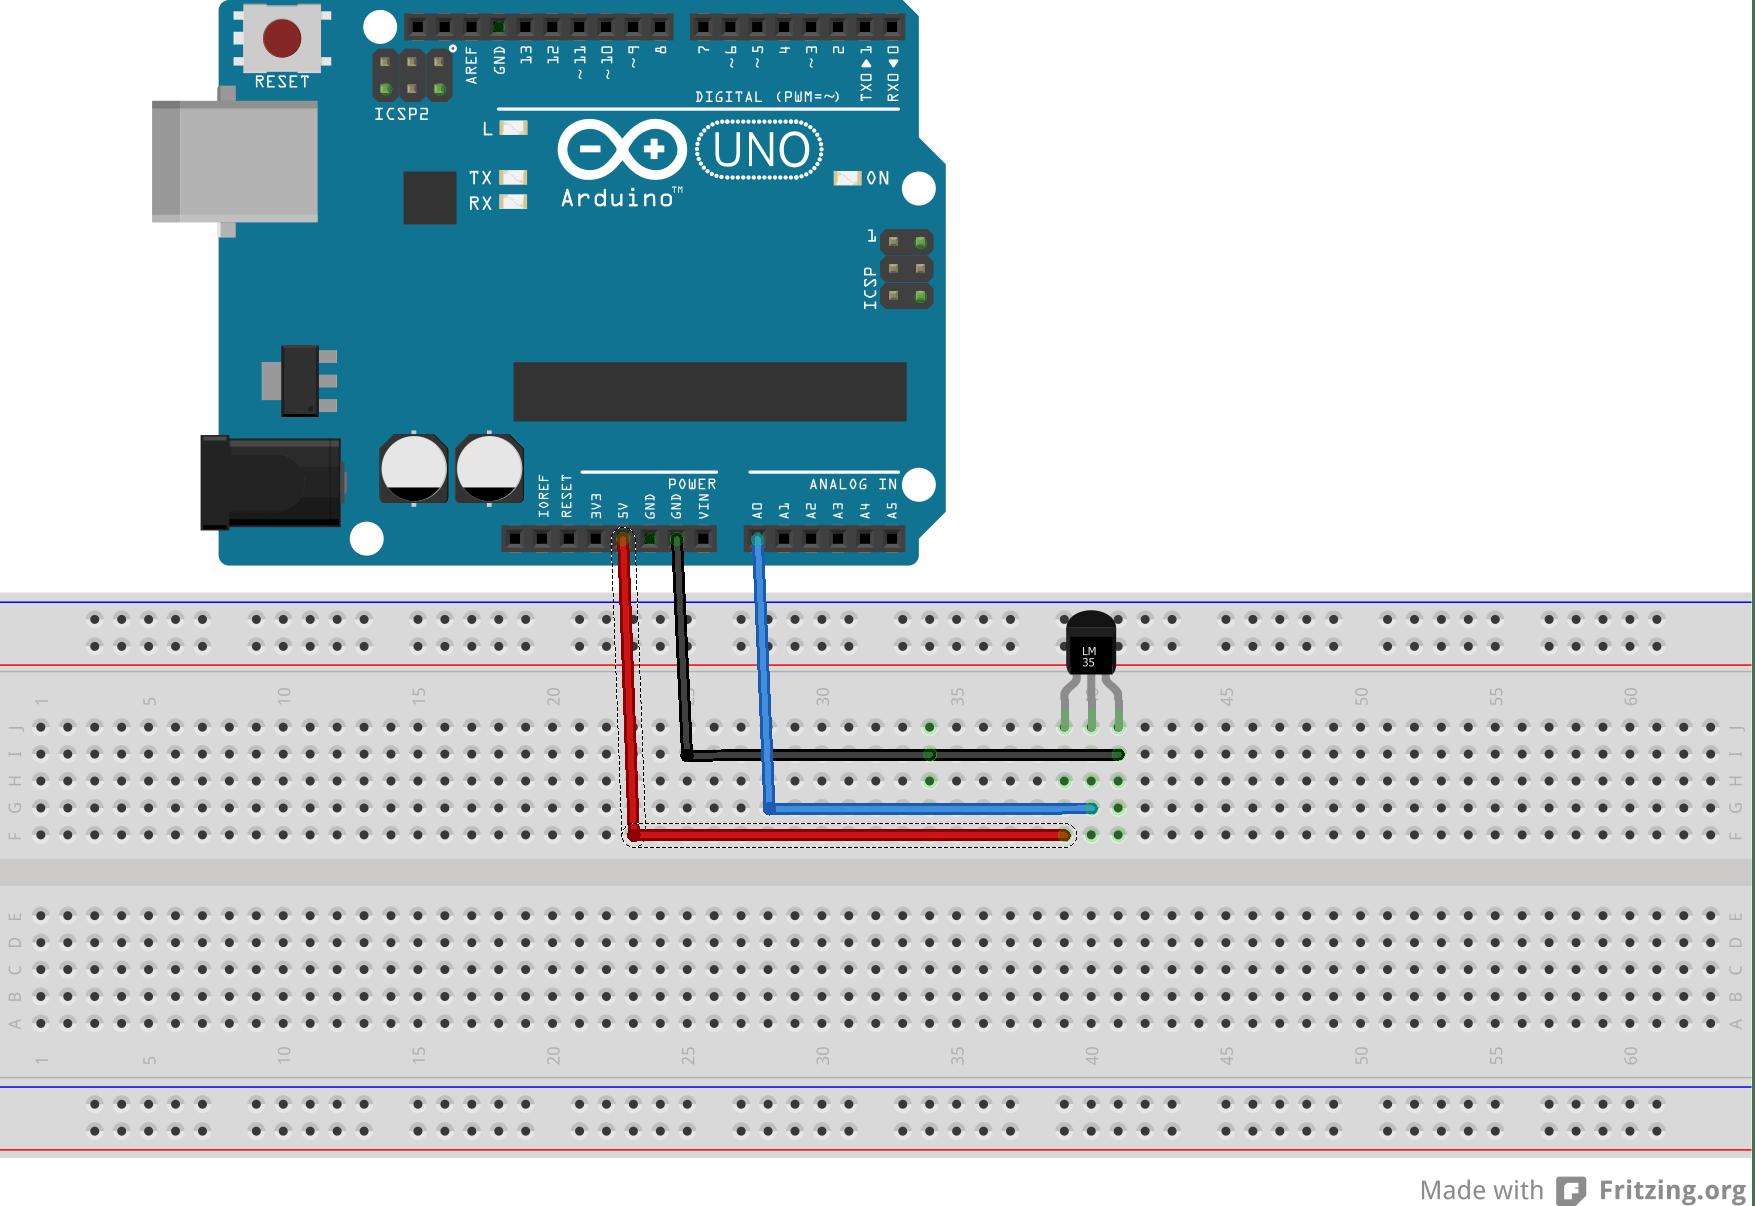 bulldog security remote car alarm diagram loncin 50cc atv wiring viper 300 esp diagram, viper, free engine image for user manual download